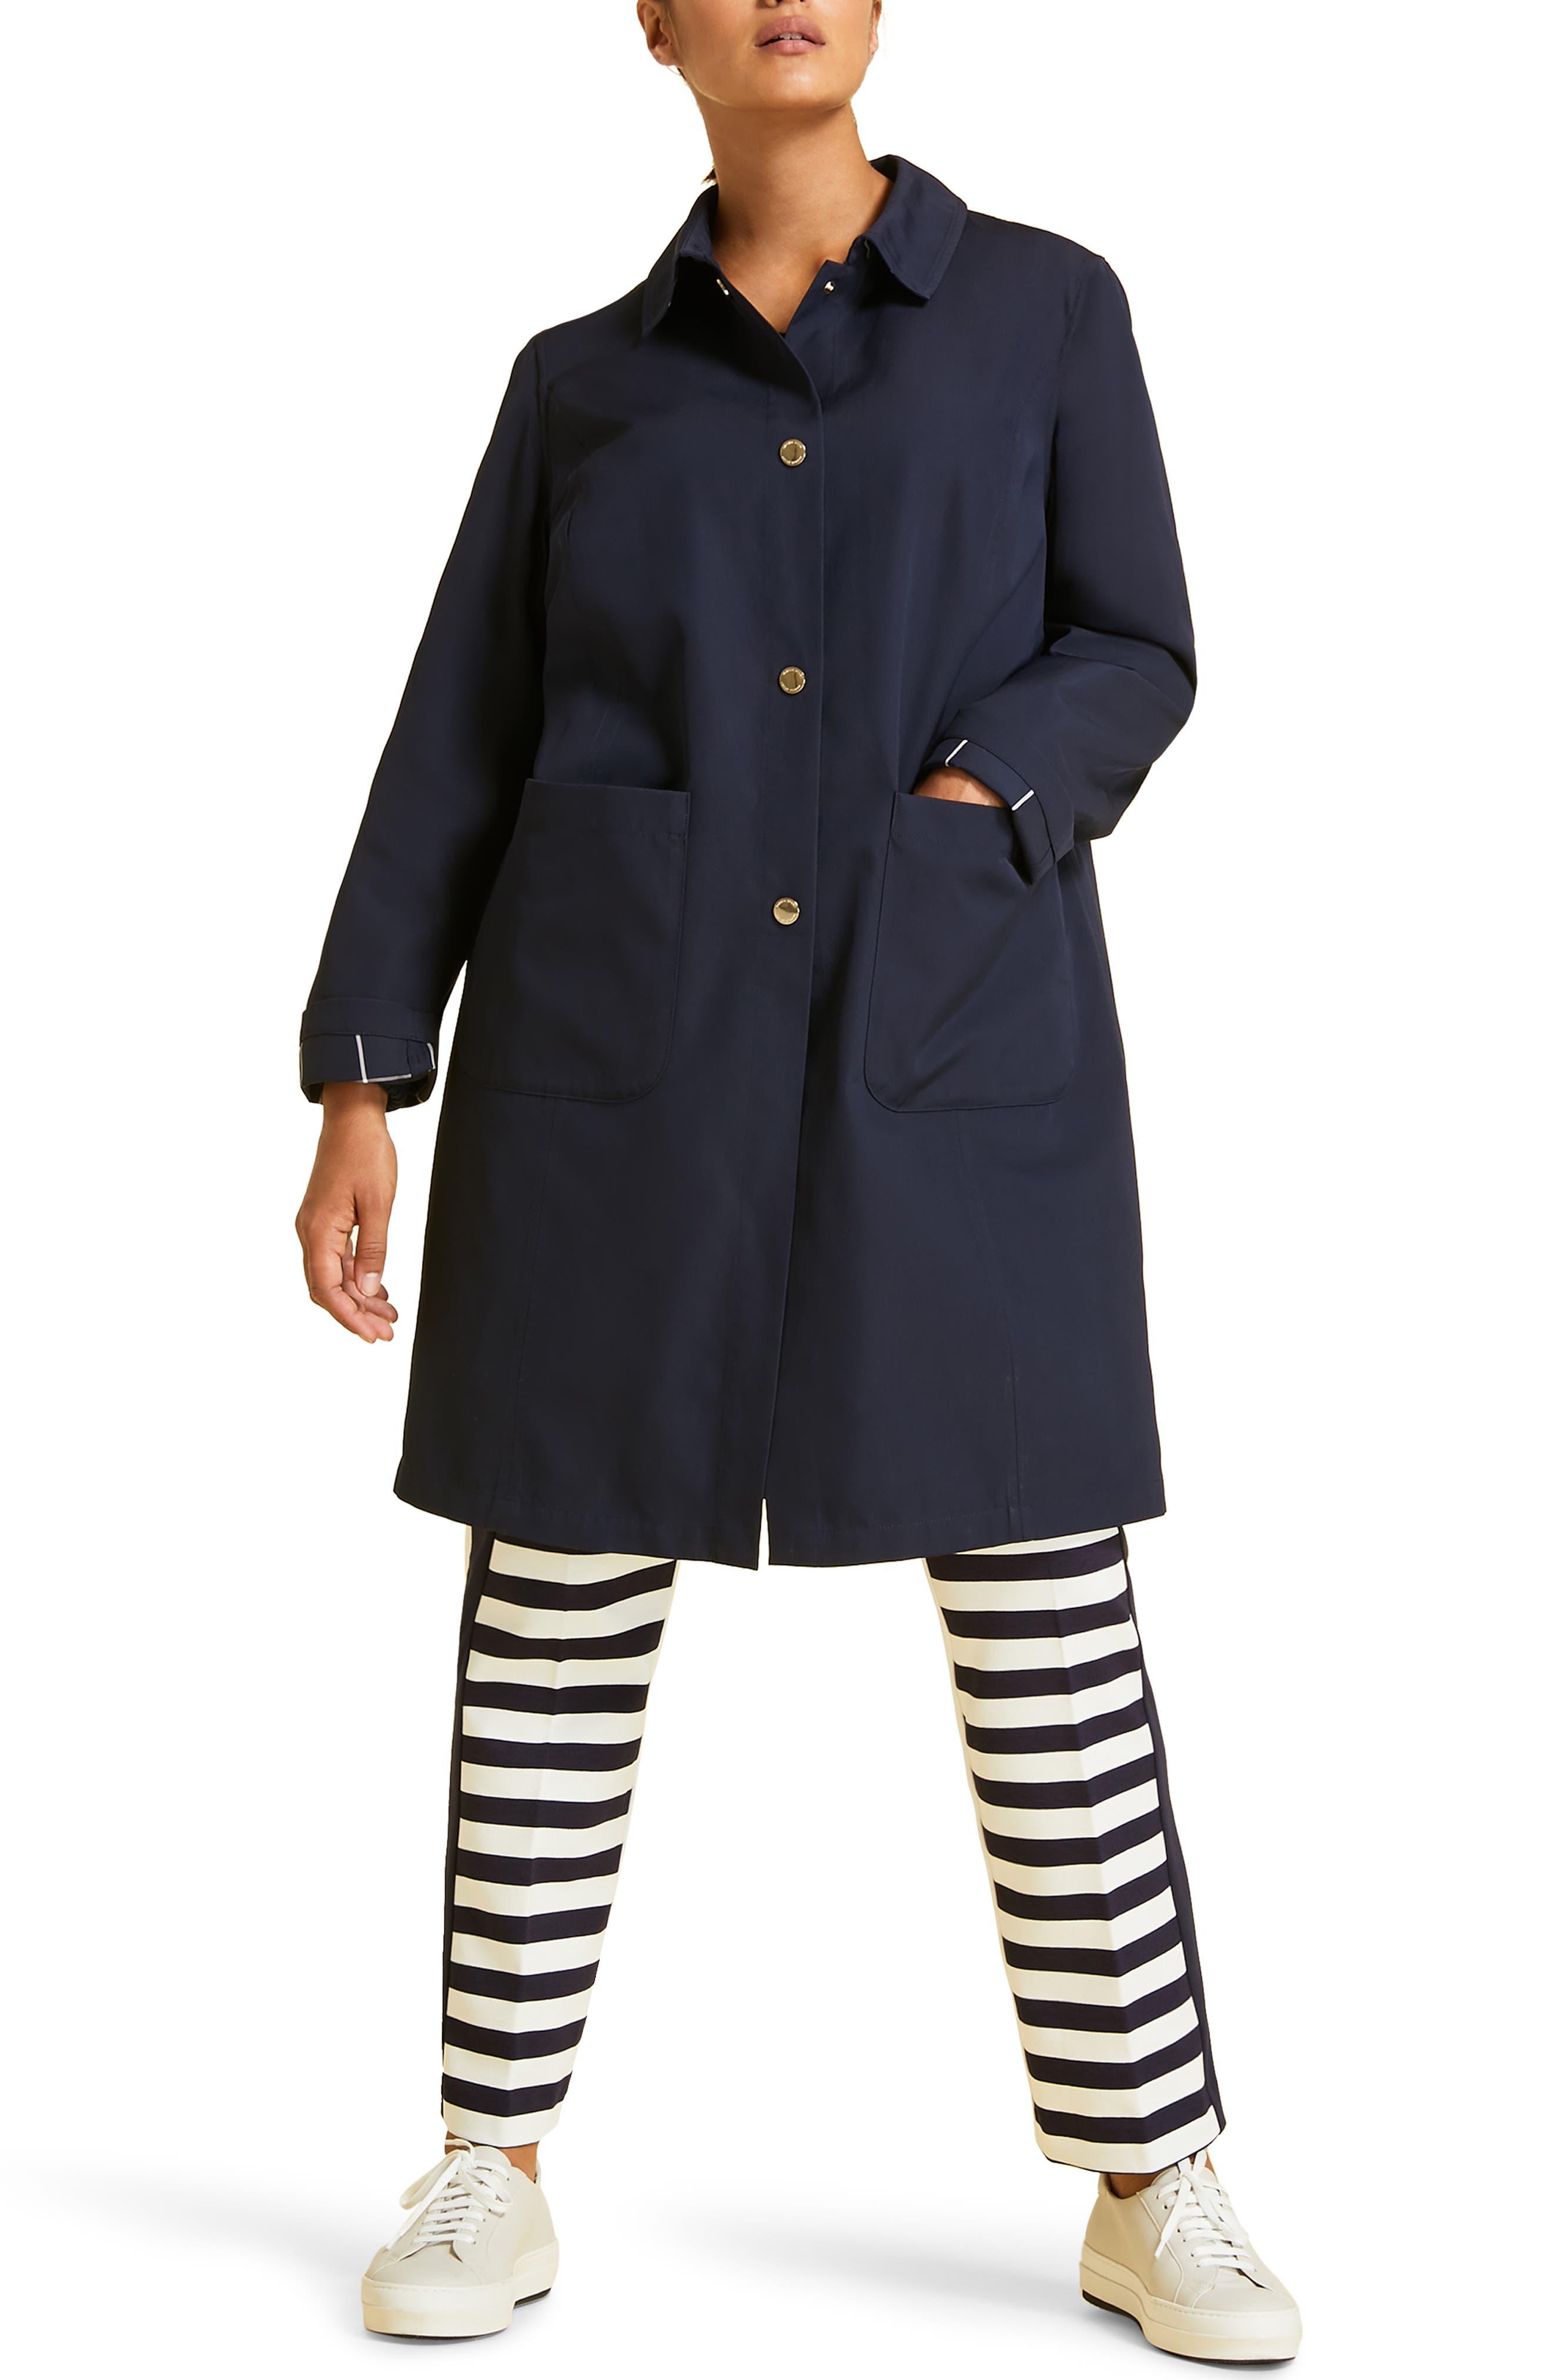 Tabella Reversible Raincoat,                             Main thumbnail 1, color,                             NAVY BLUE